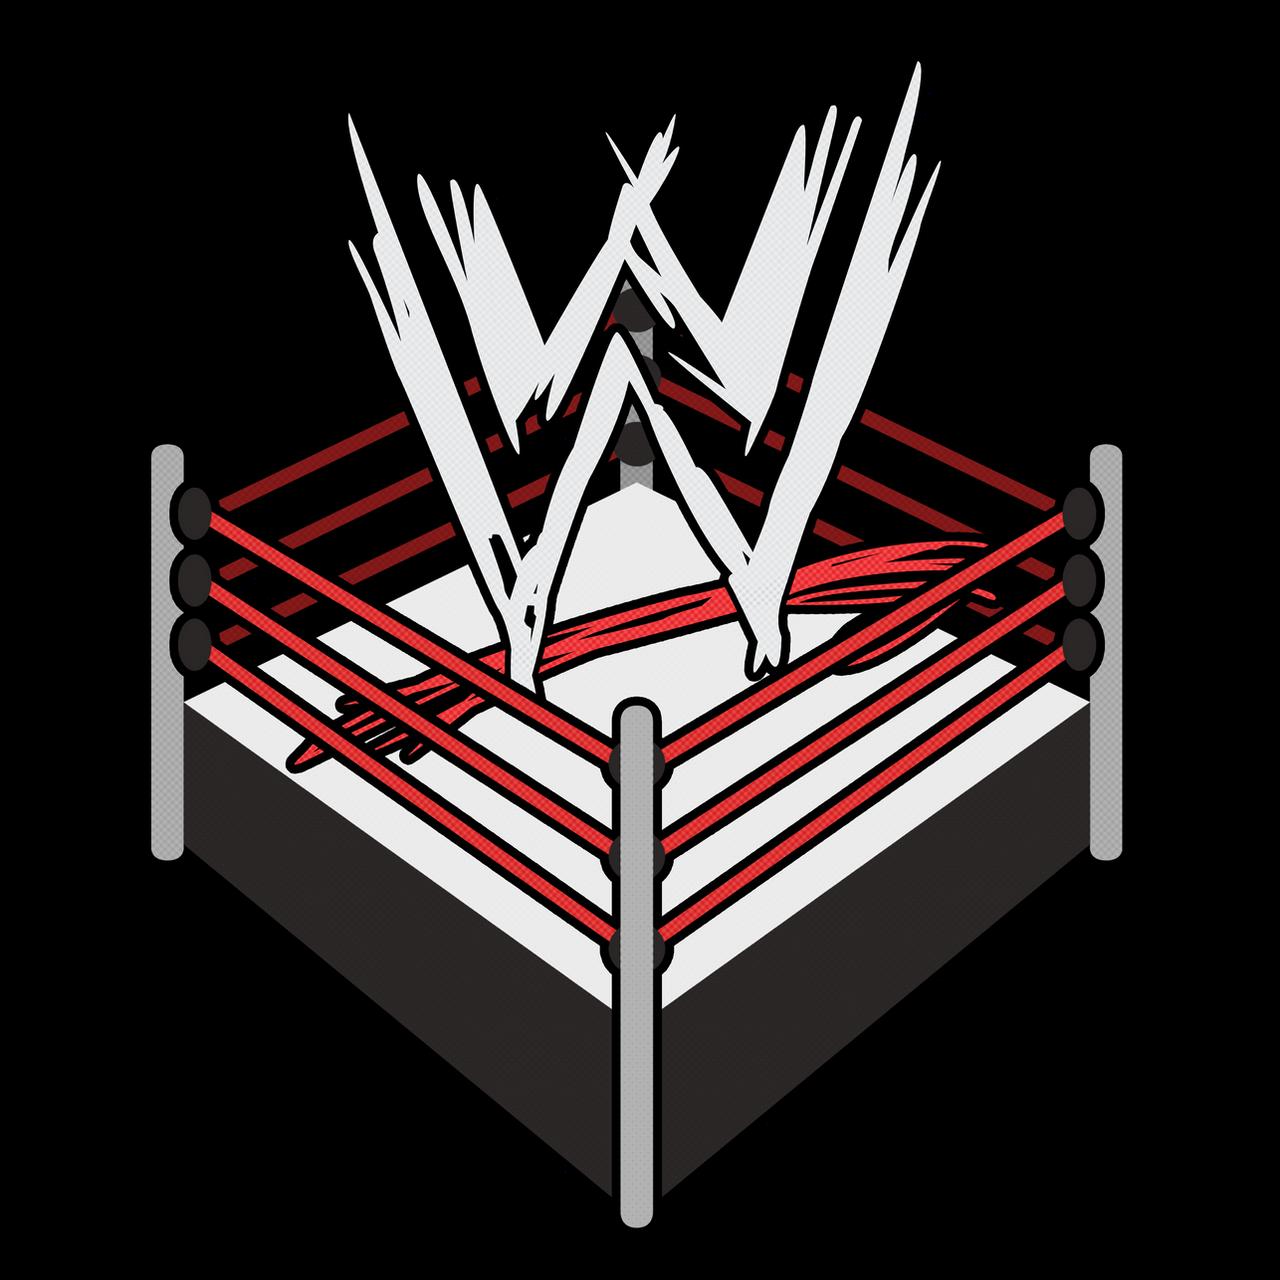 WWE Ring Logo 2 by CmOrigins on DeviantArt